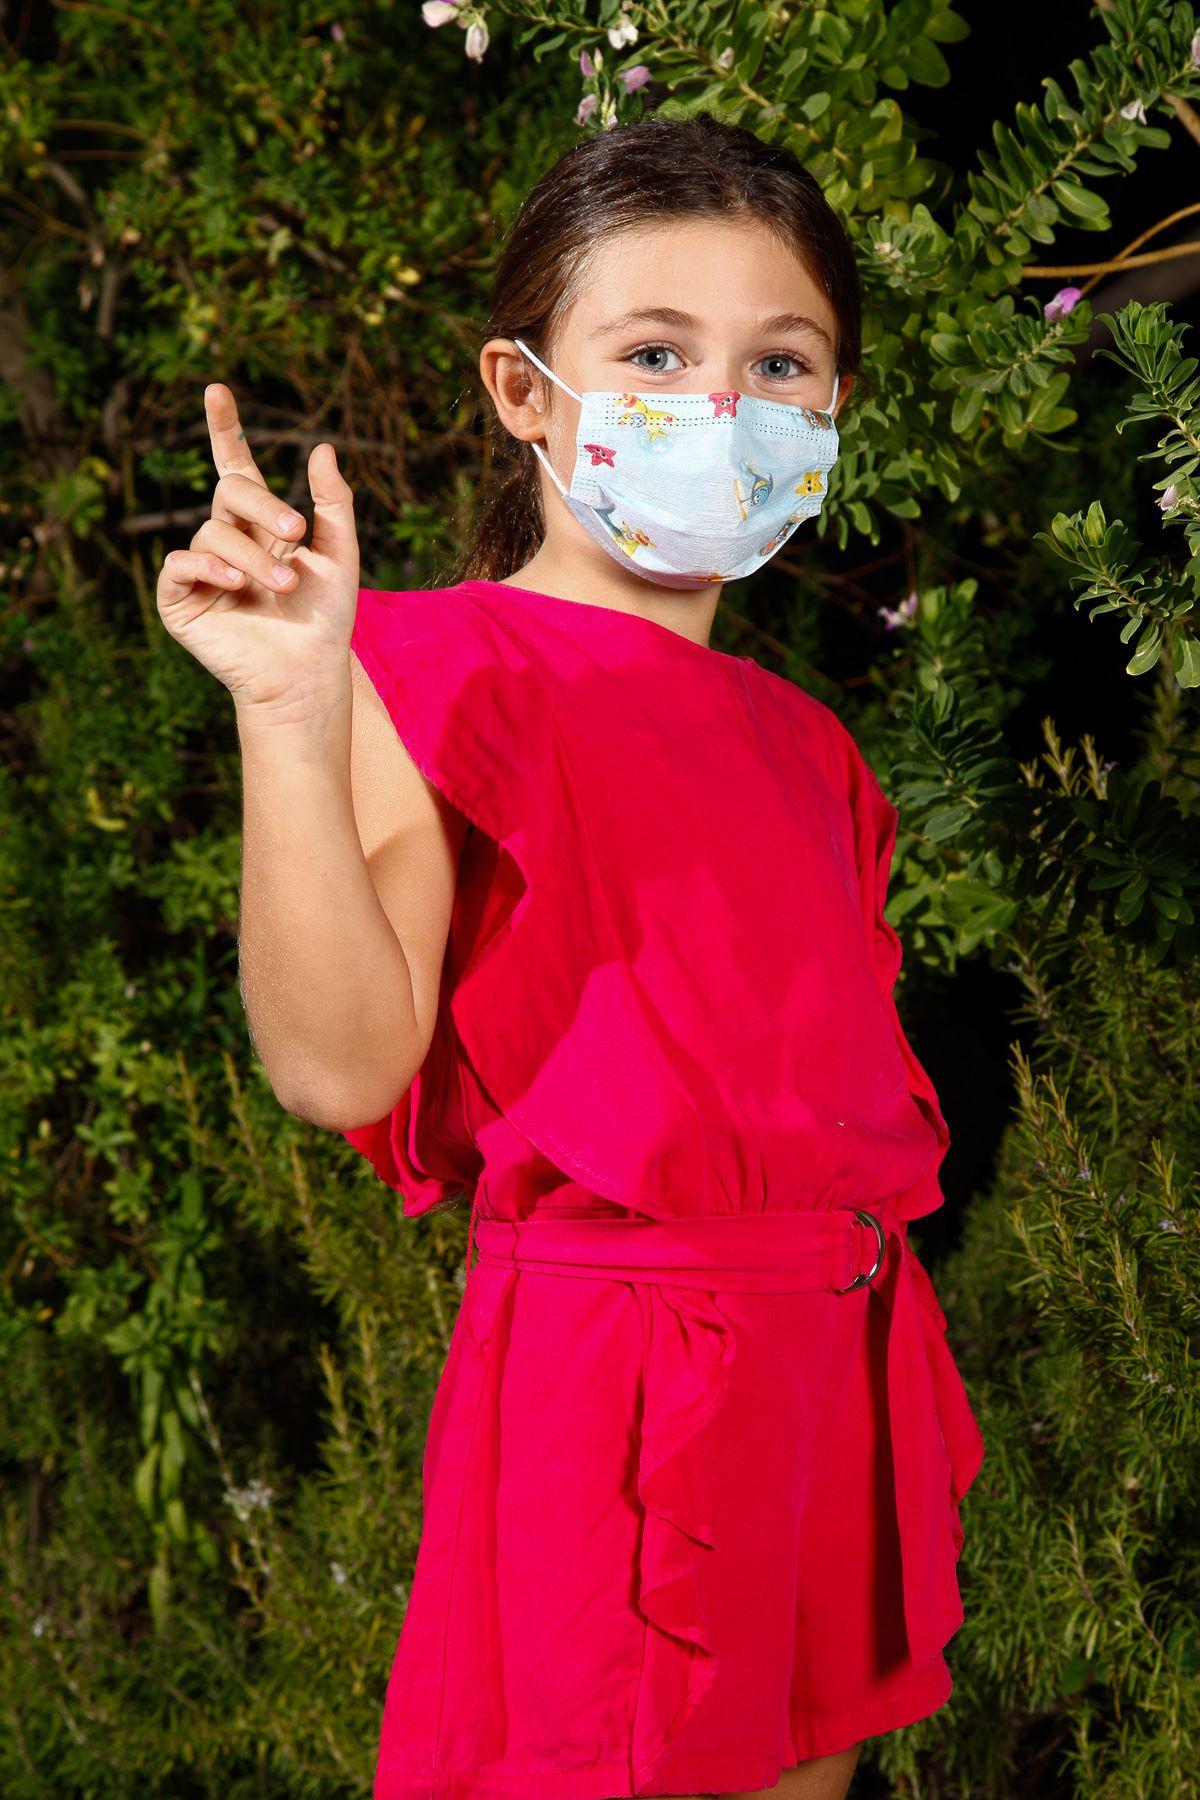 Einwegdraht Gummi Medizinische Kindergesichtsmaske Automuster 10er Pack